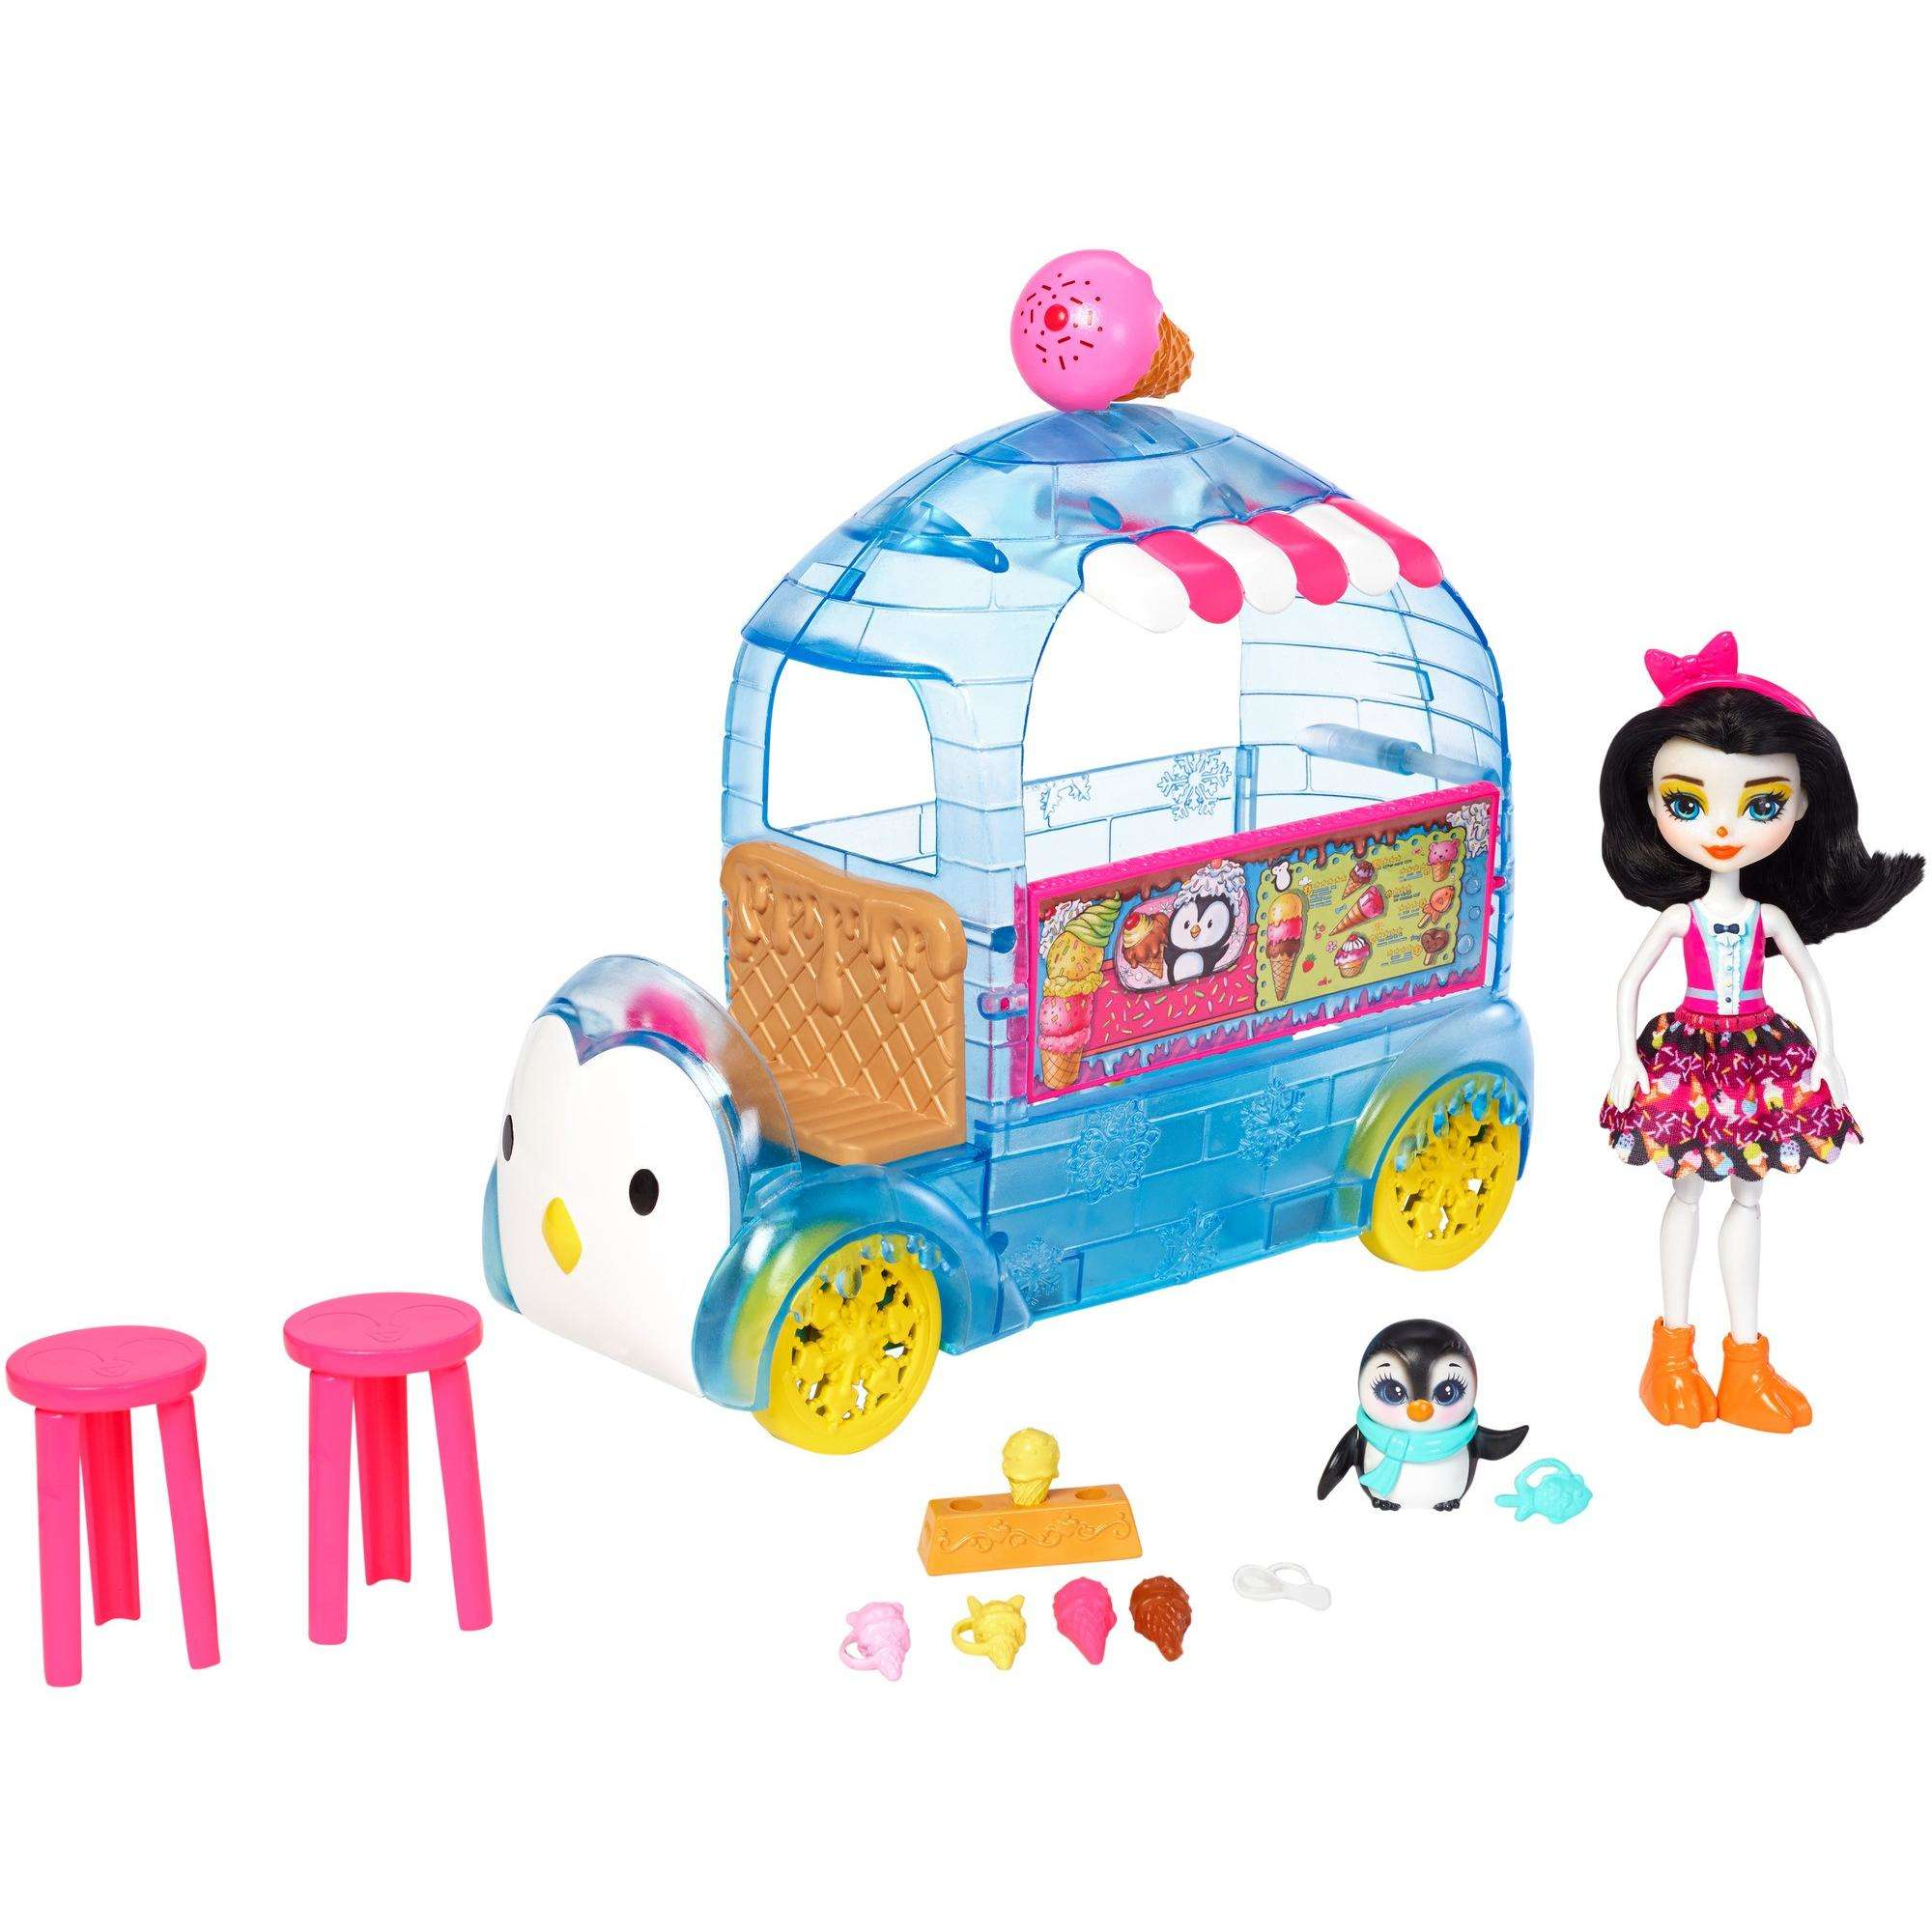 Enchantimals Wheel Frozen Treats Preena Penguin Doll & Playset by Mattel